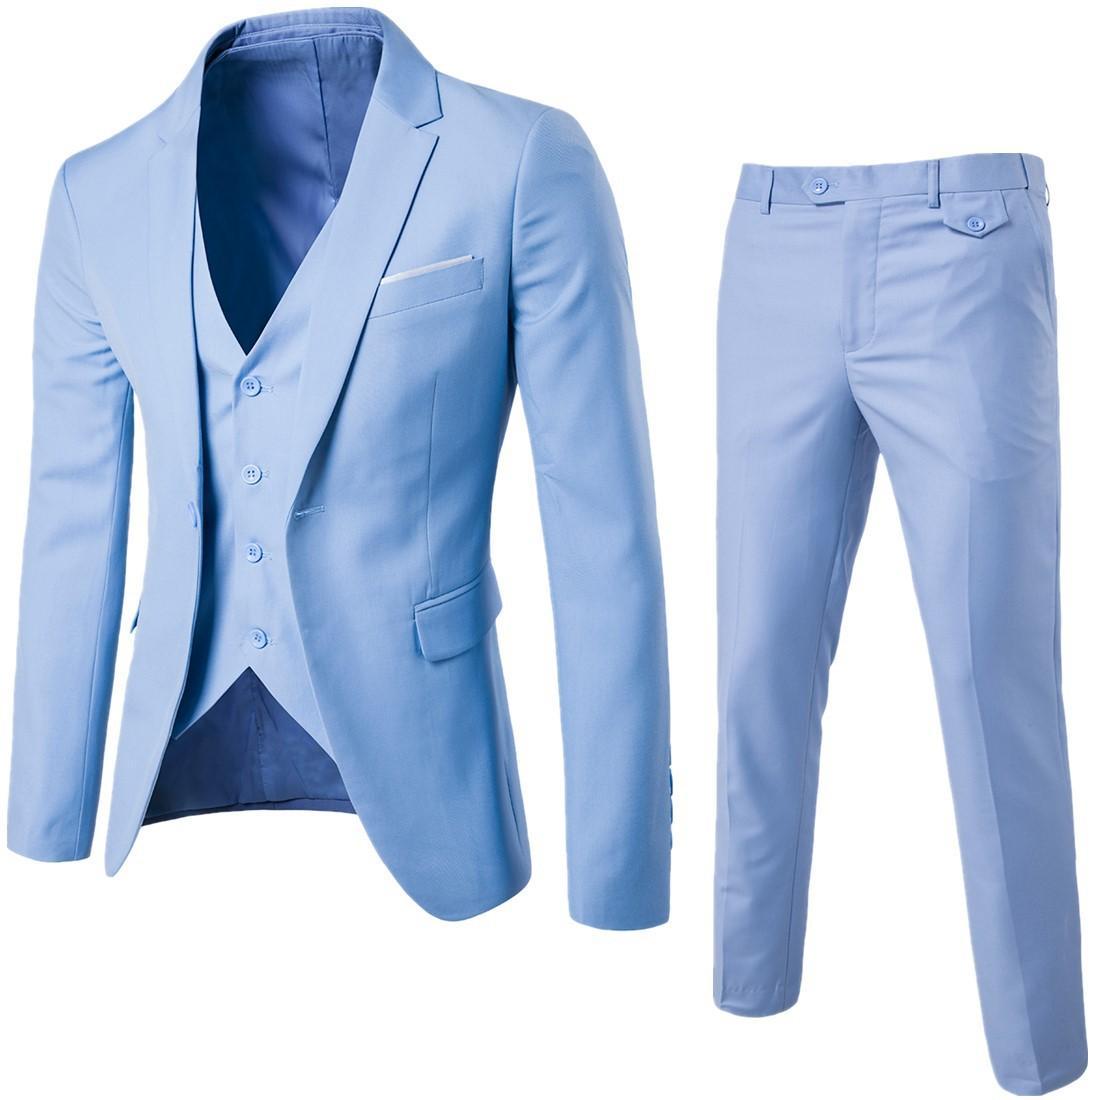 2018 Outono New Style Men Casual Tamanho Grande Hot Selling Suit estilo coreano Slim Fit terno de três peças Set Juventude Moda